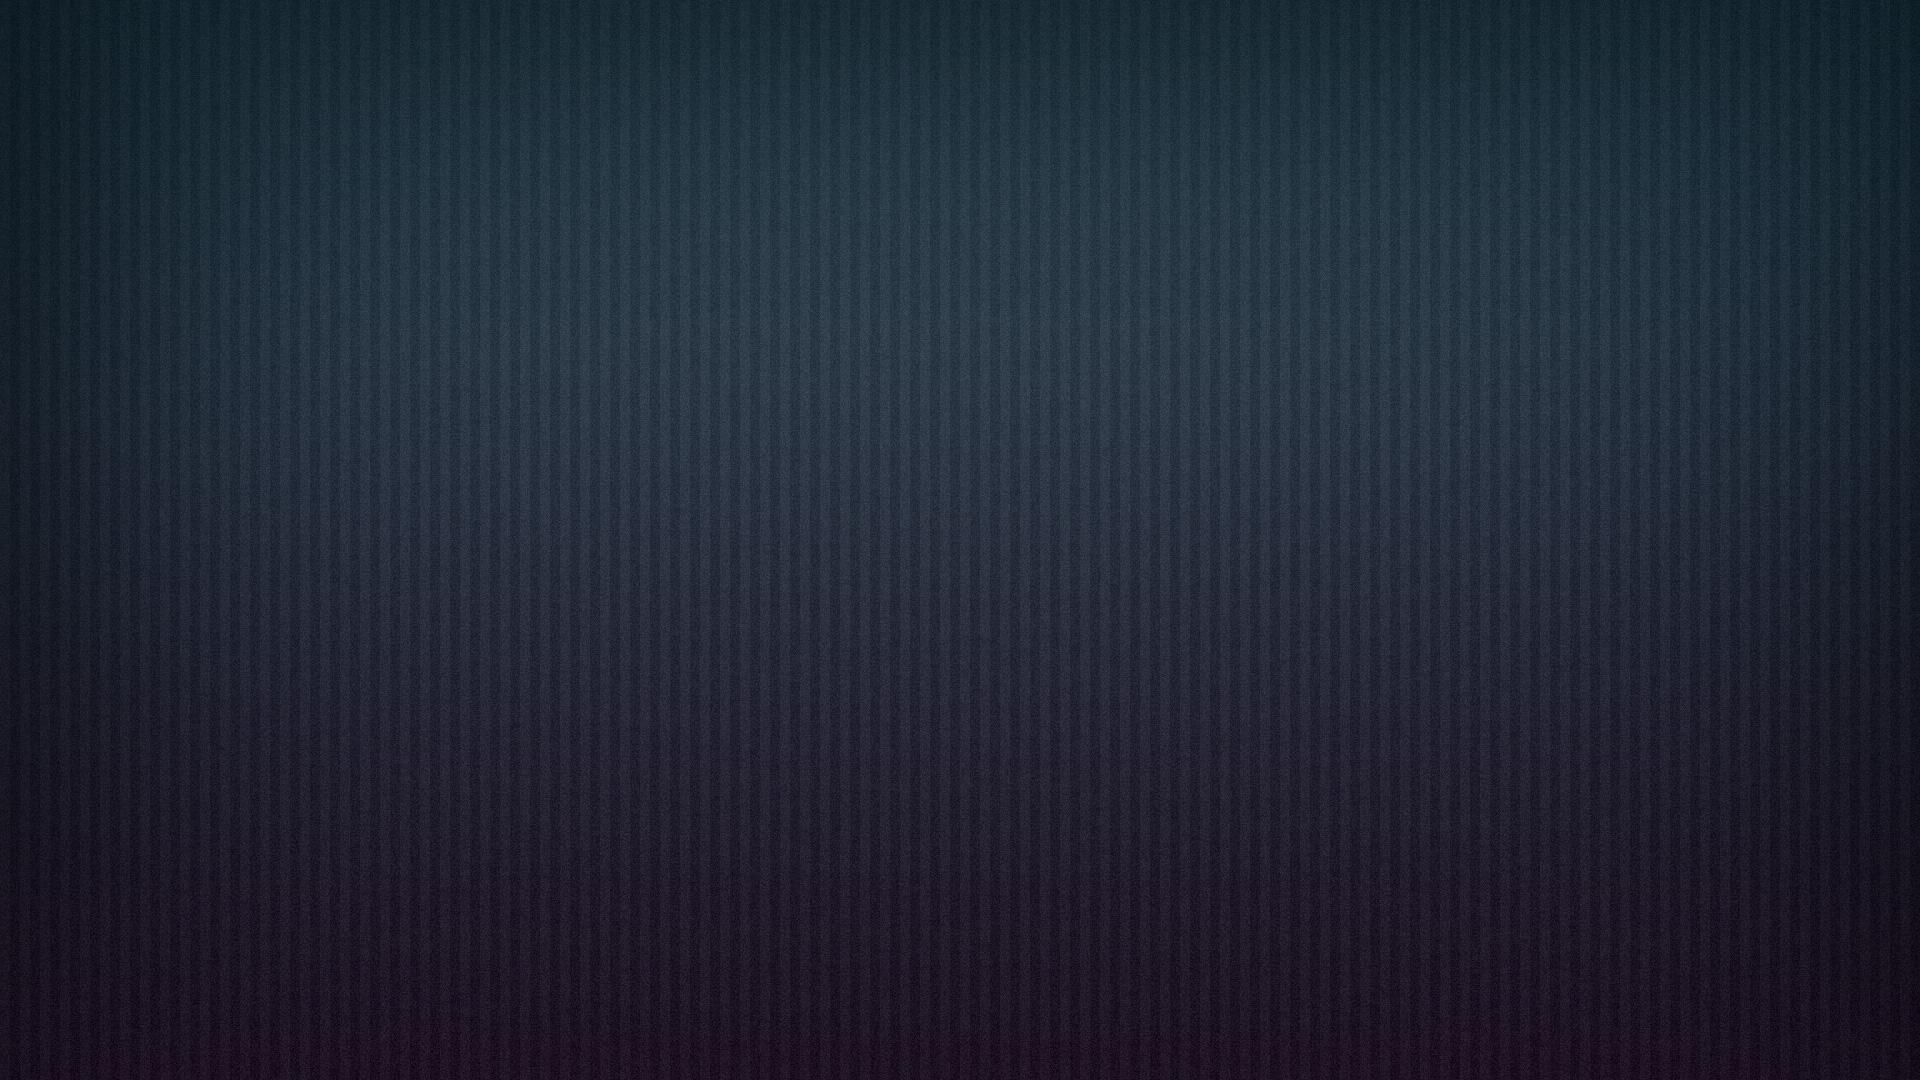 Elegant_Background-8